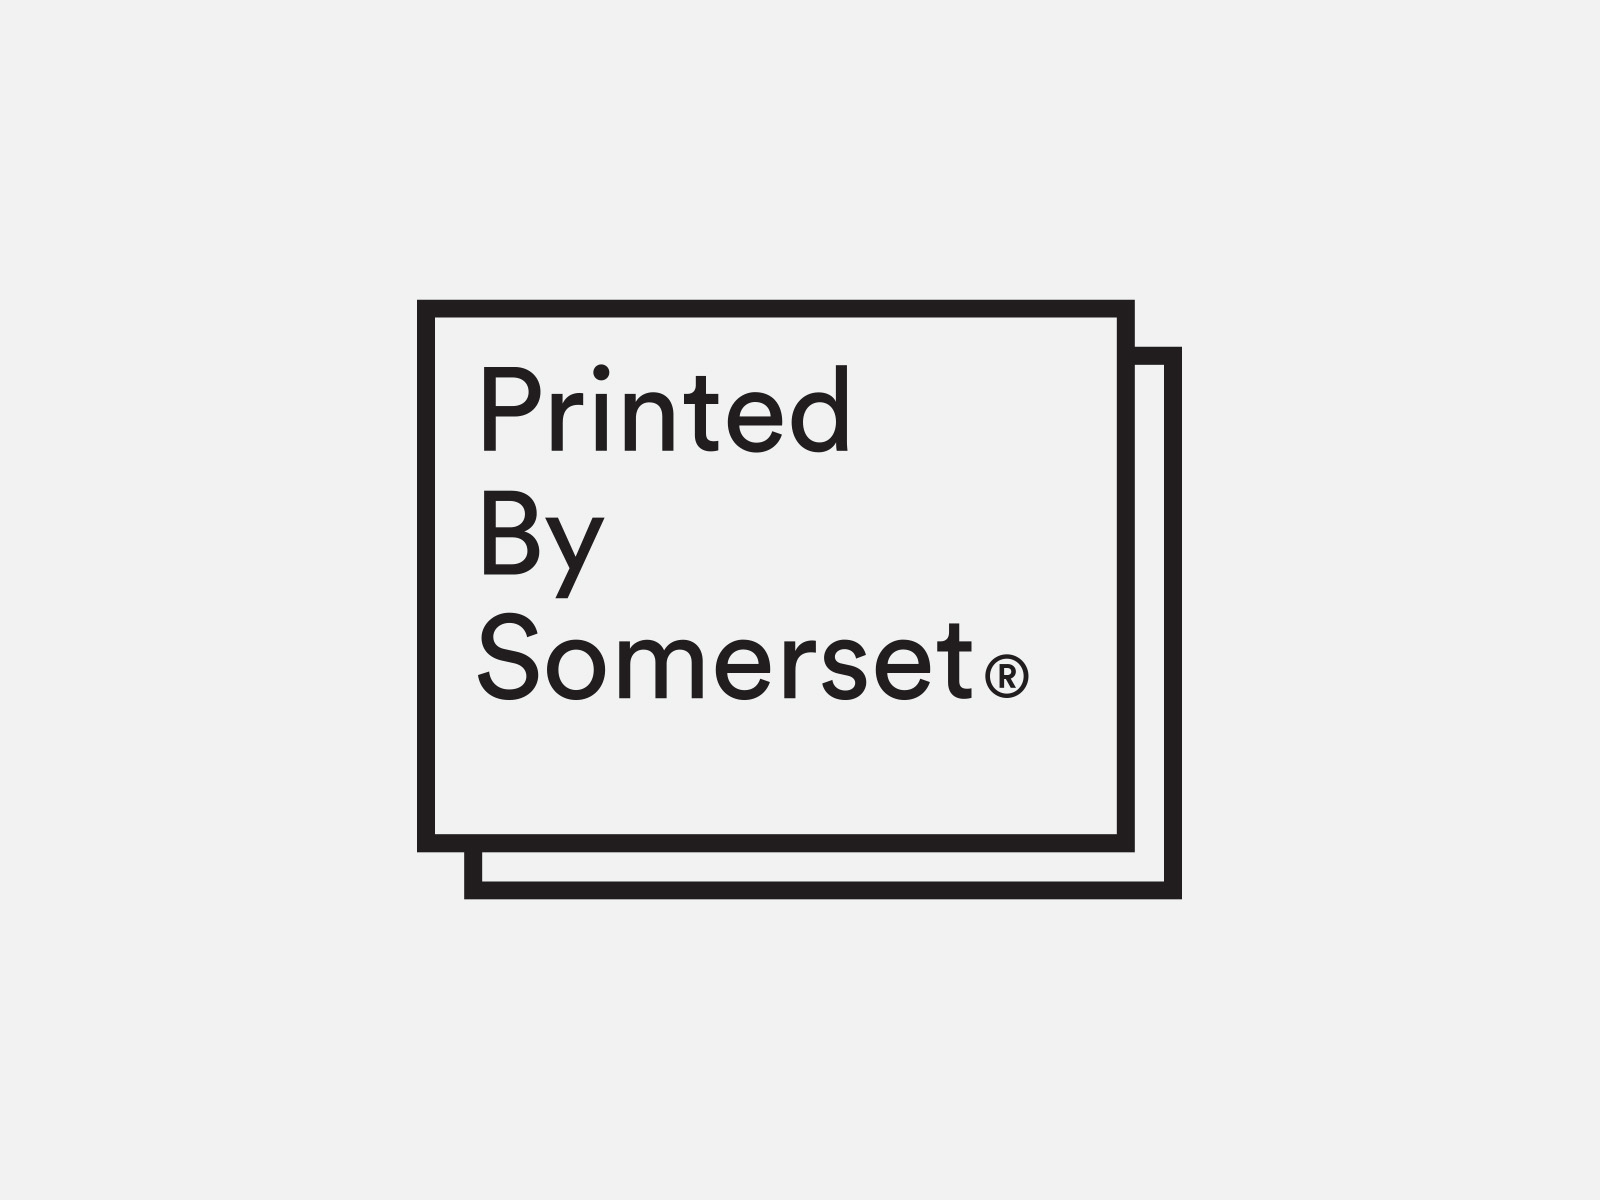 Printed by Somerset by Leo Burnett Design